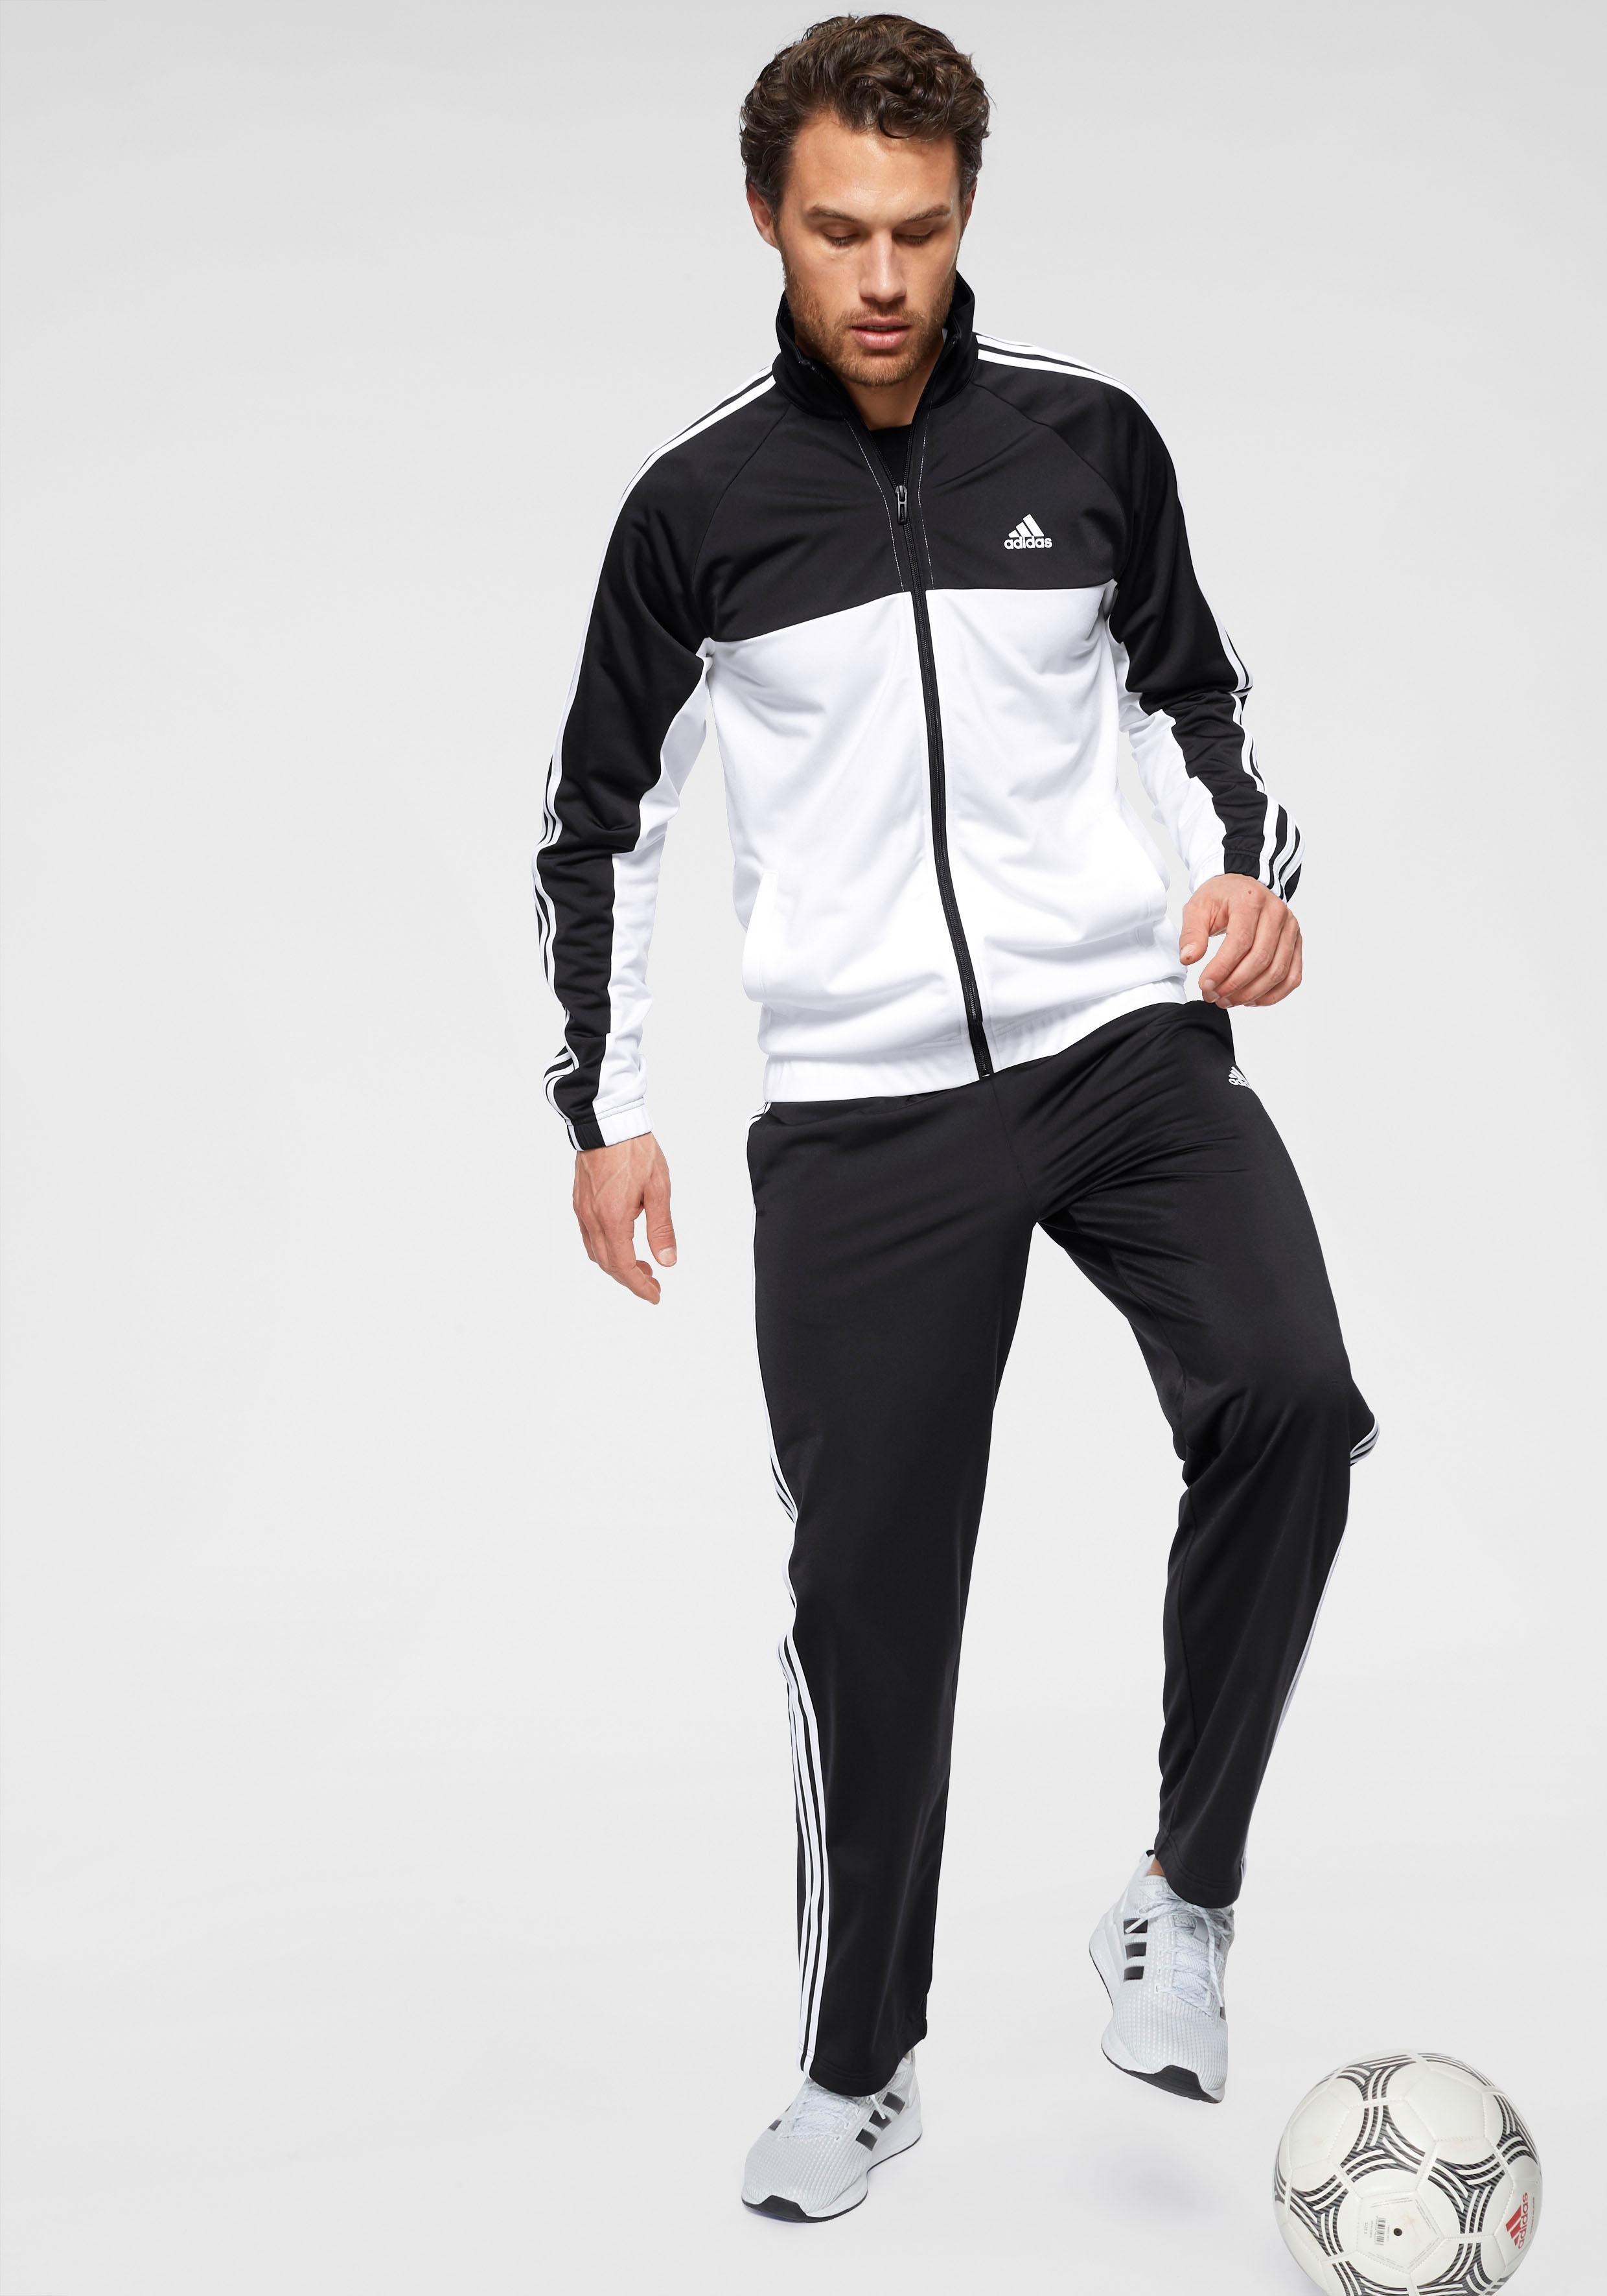 adidas Performance Trainingsanzug OSR P 3 STRIPES TRACKSUIT   Sportbekleidung > Sportanzüge > Trainingsanzüge   adidas performance